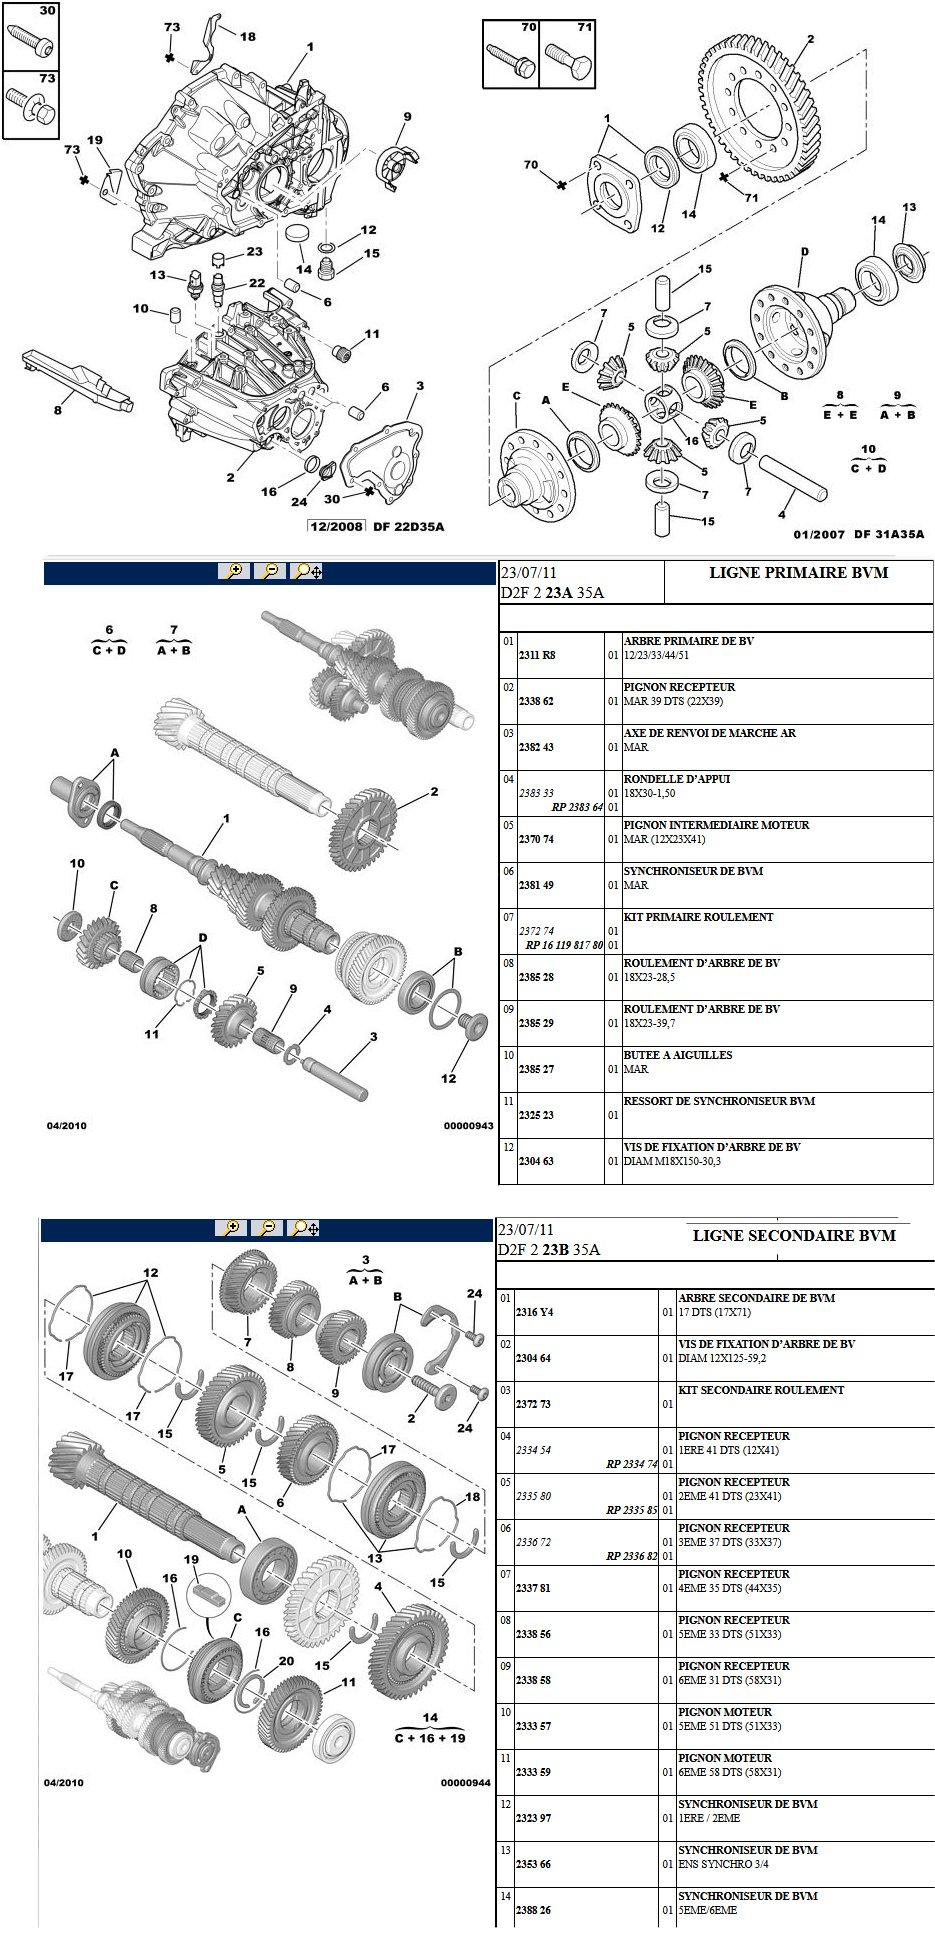 Vue Eclatee Bvm6 407 2 2 Hdi Peugeot Mecanique